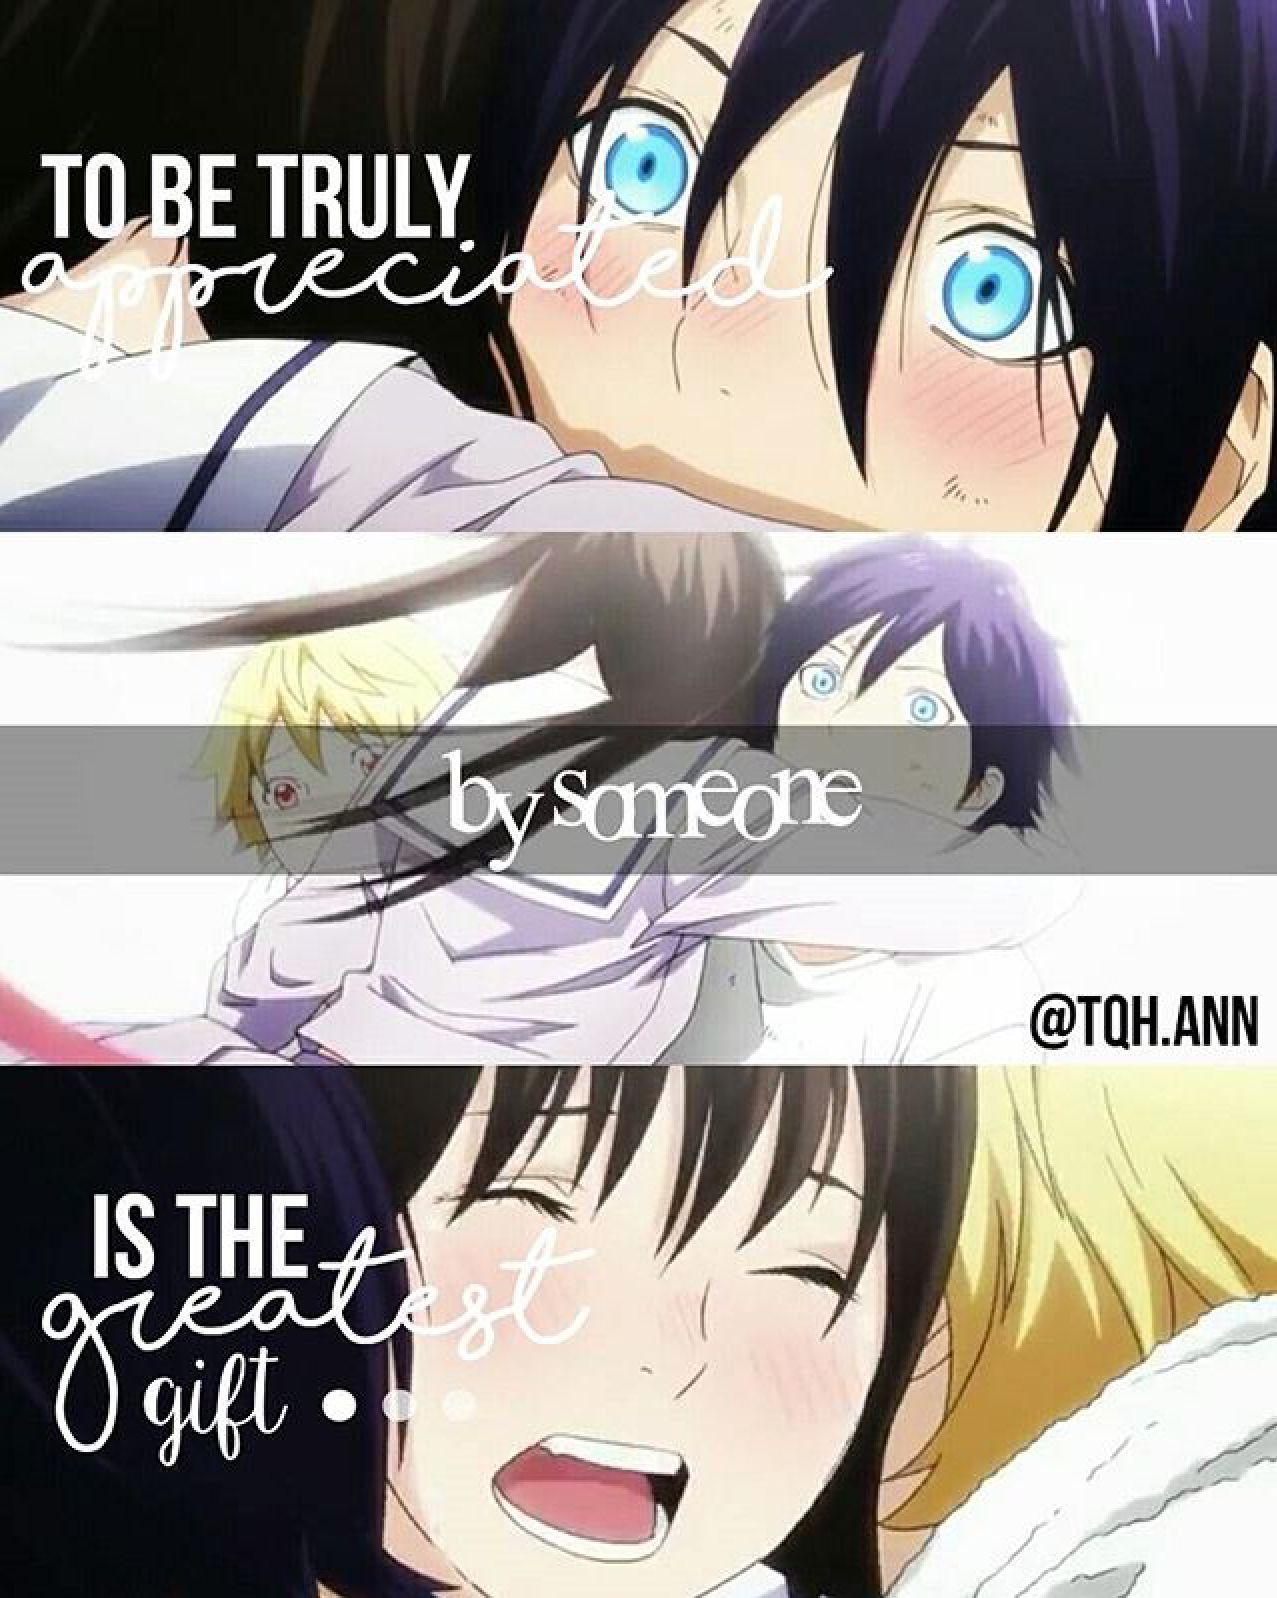 Pin by Becks 🌺 on Anime&Manga  Anime quotes, Manga quotes, Memes